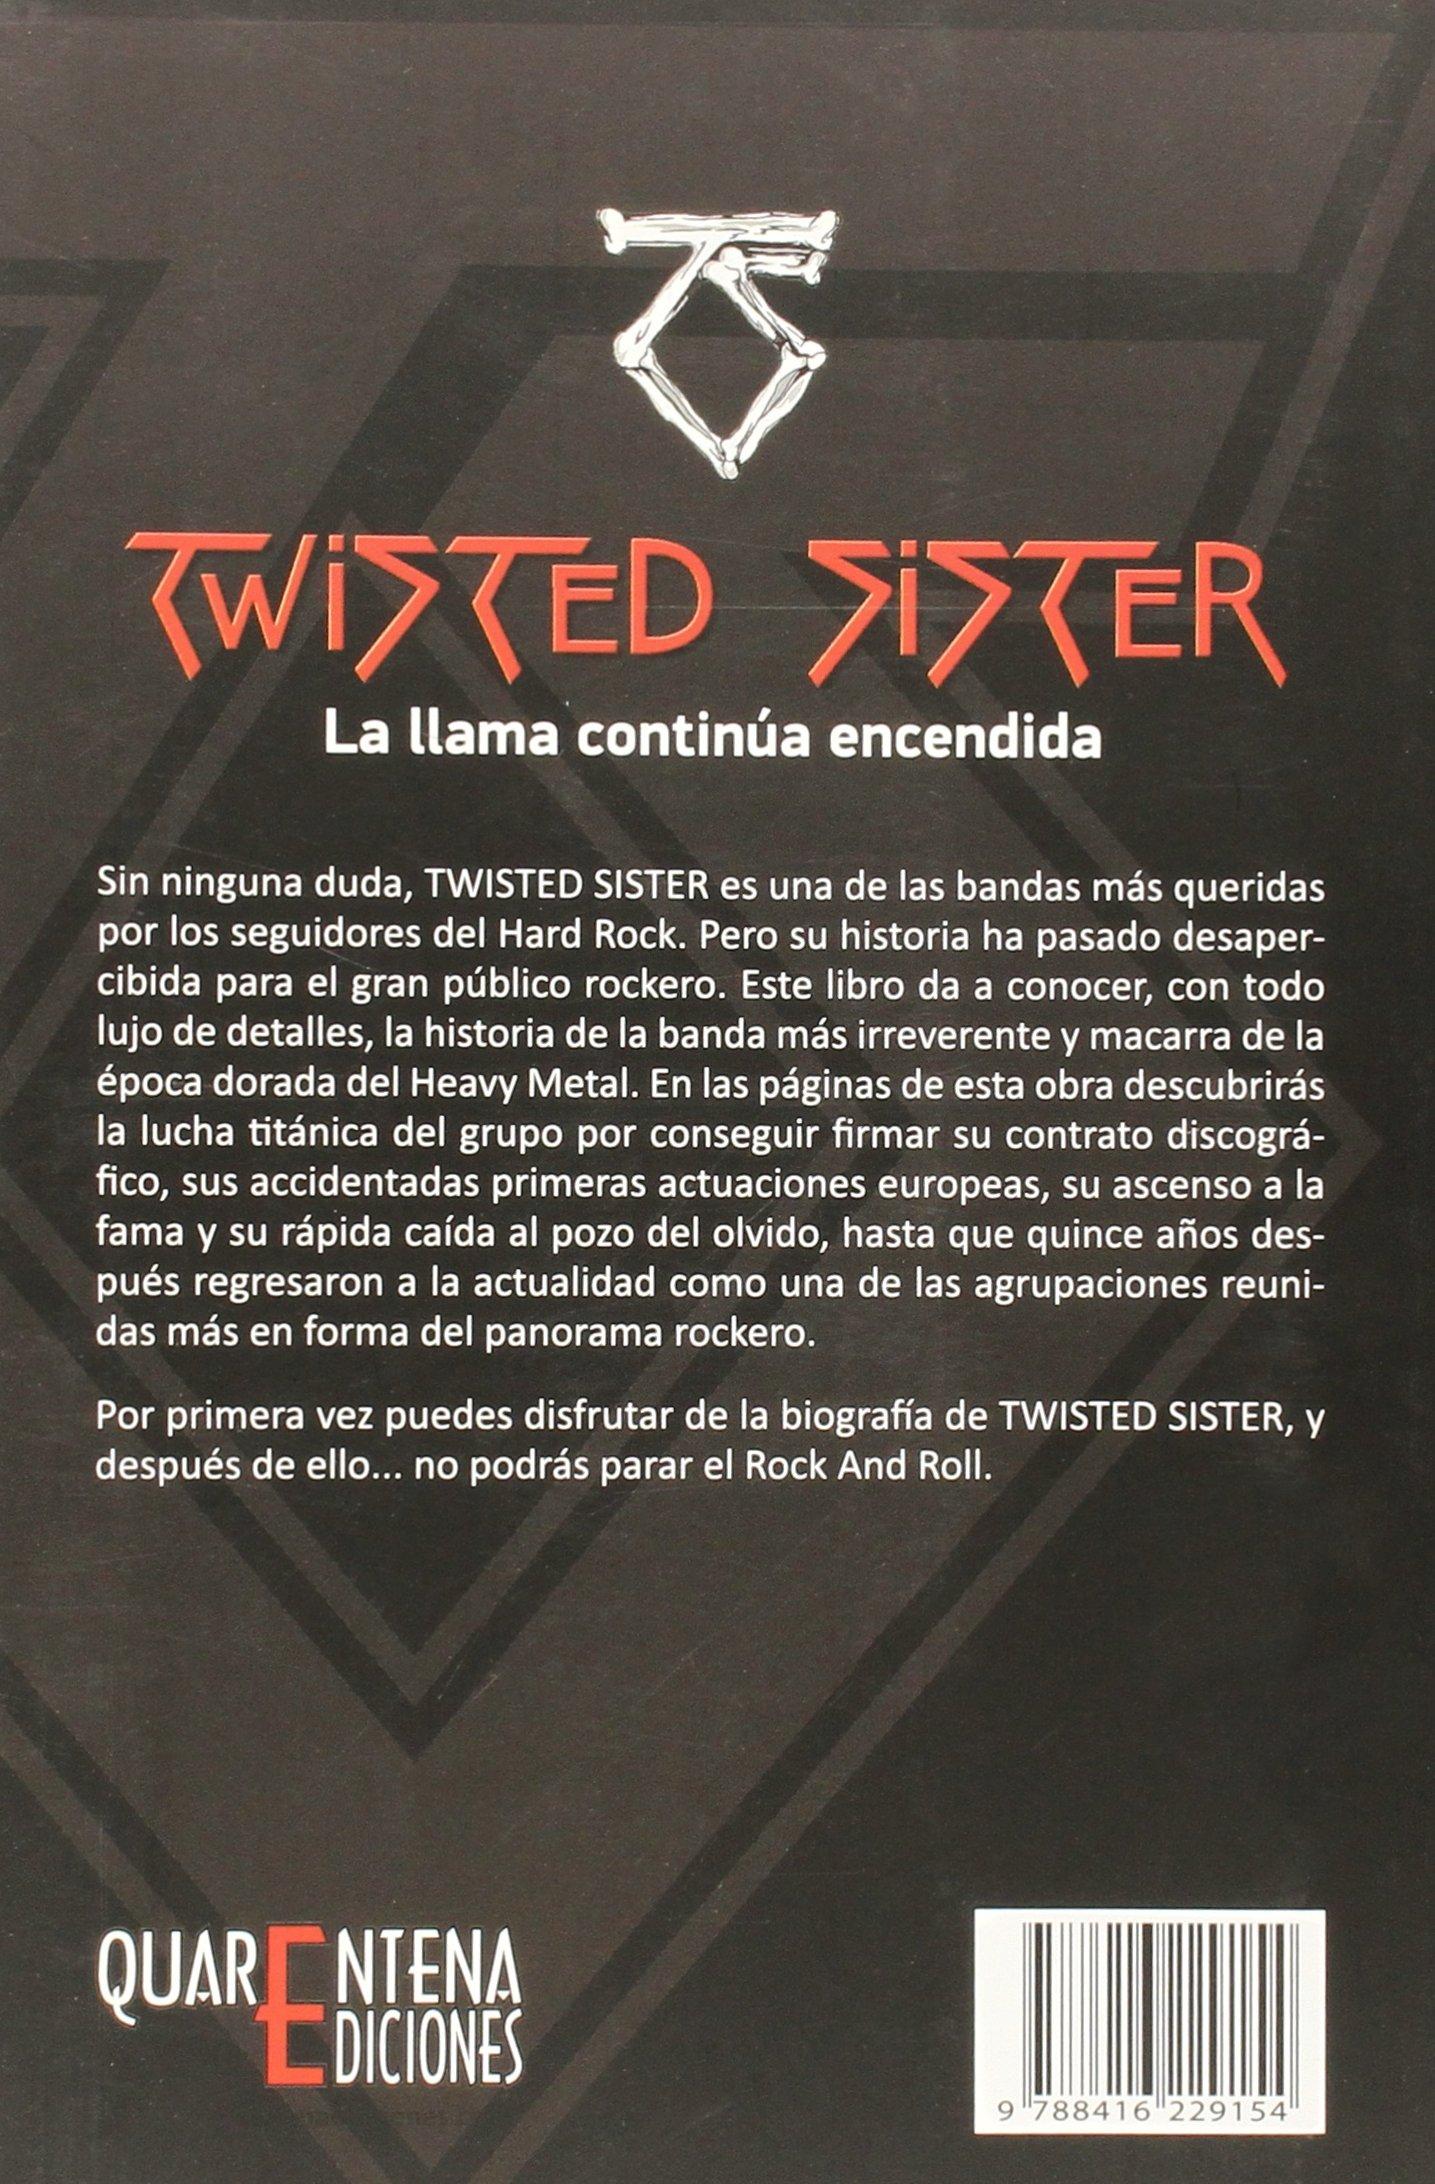 Twisted Sister: La llama continúa encendida